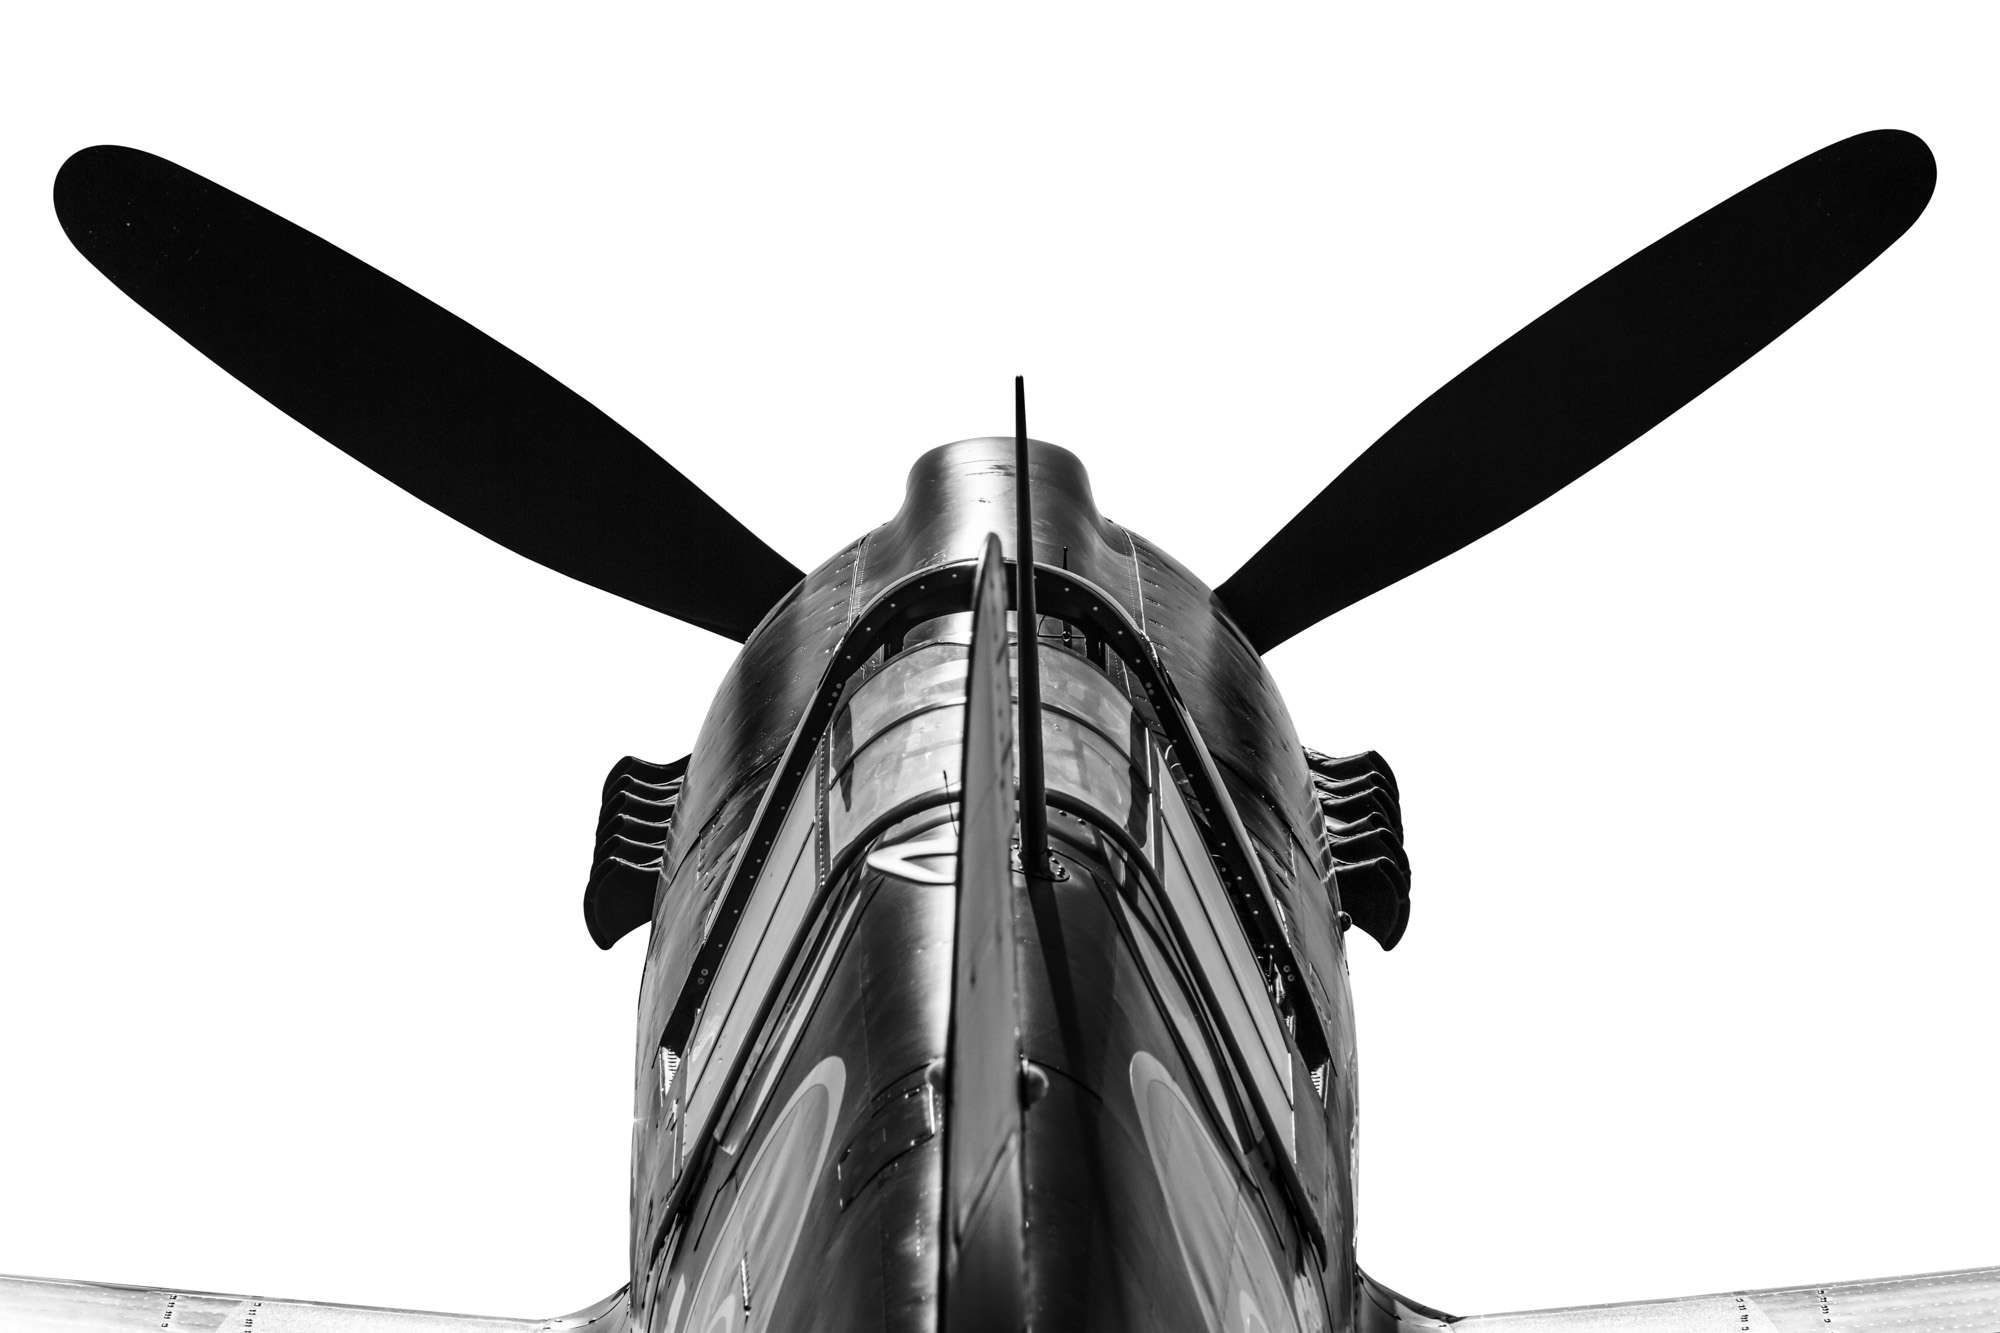 Gary Sheppard - Curtiss P-40 Kittyhawk